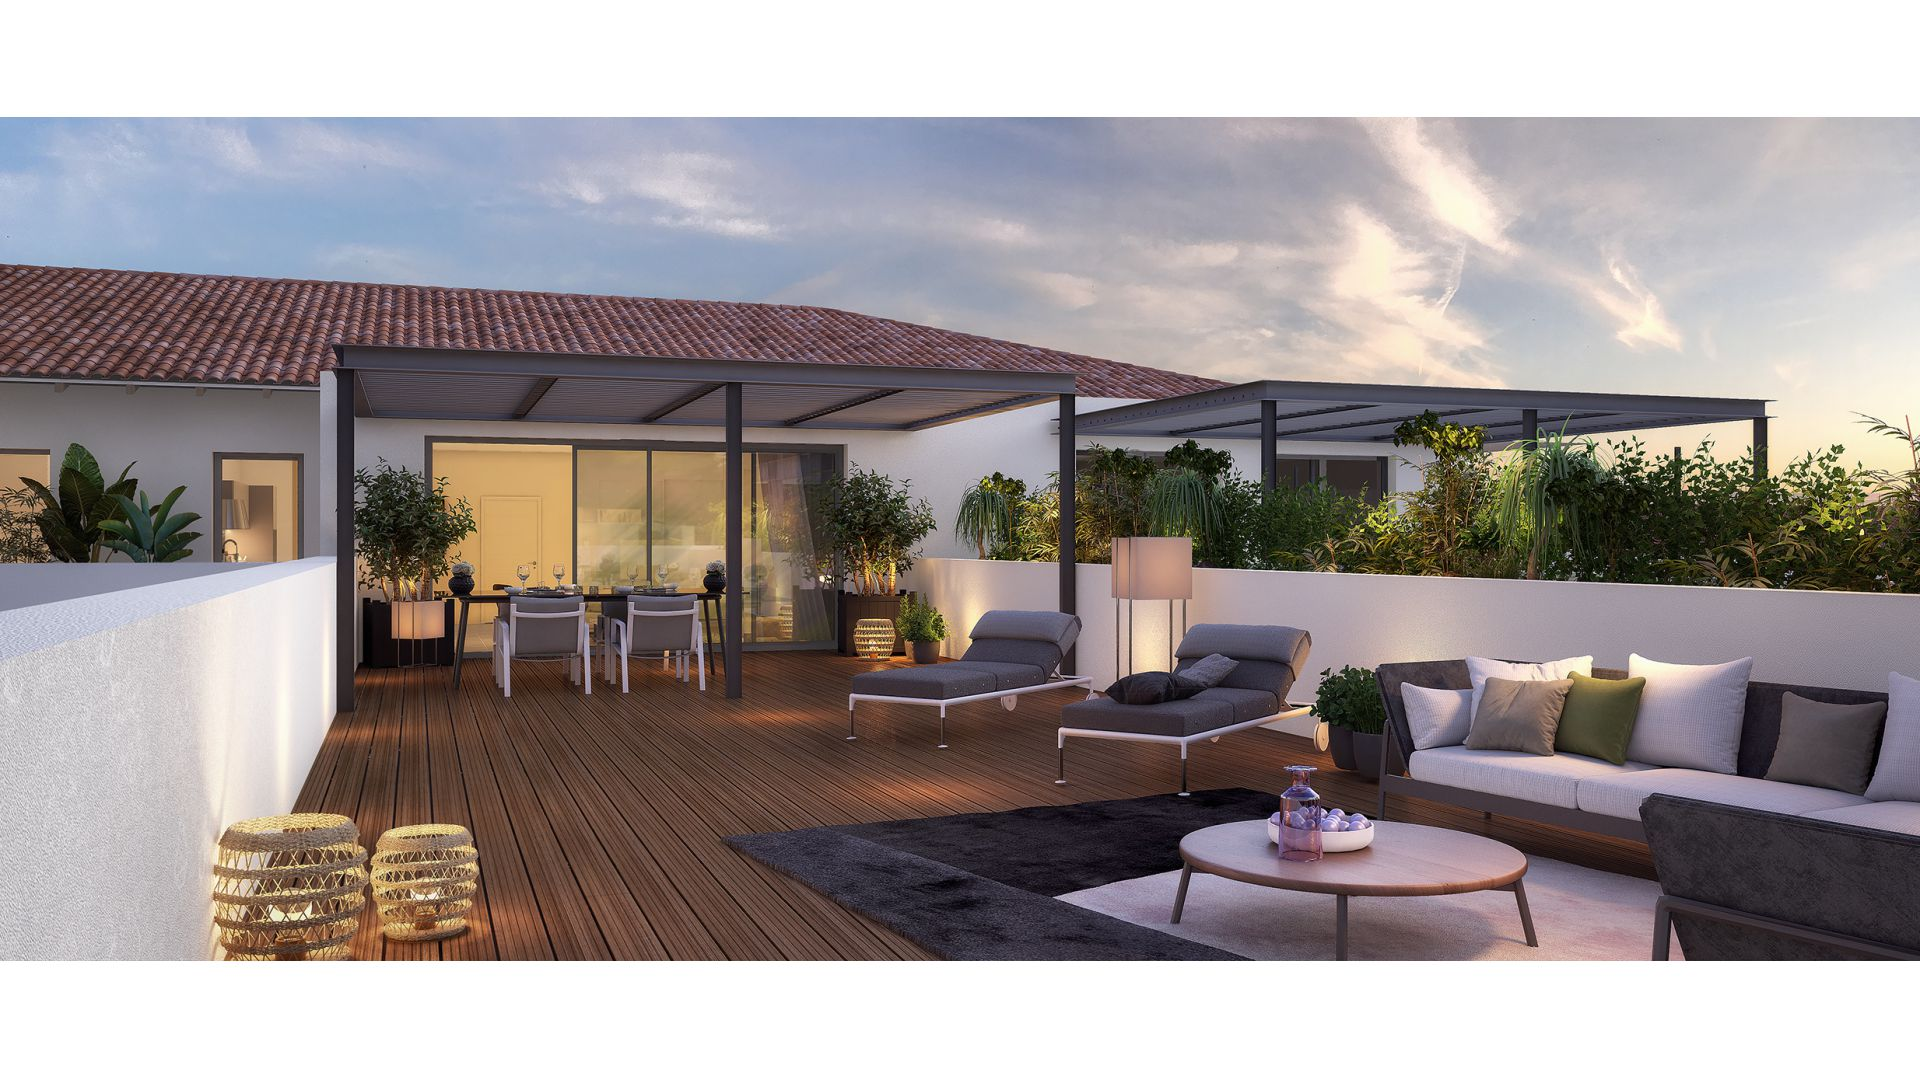 GreenCity immobilier - L-A-CAPPELLA -Castanet Tolosan centre ville - 31320 - vue terrasse